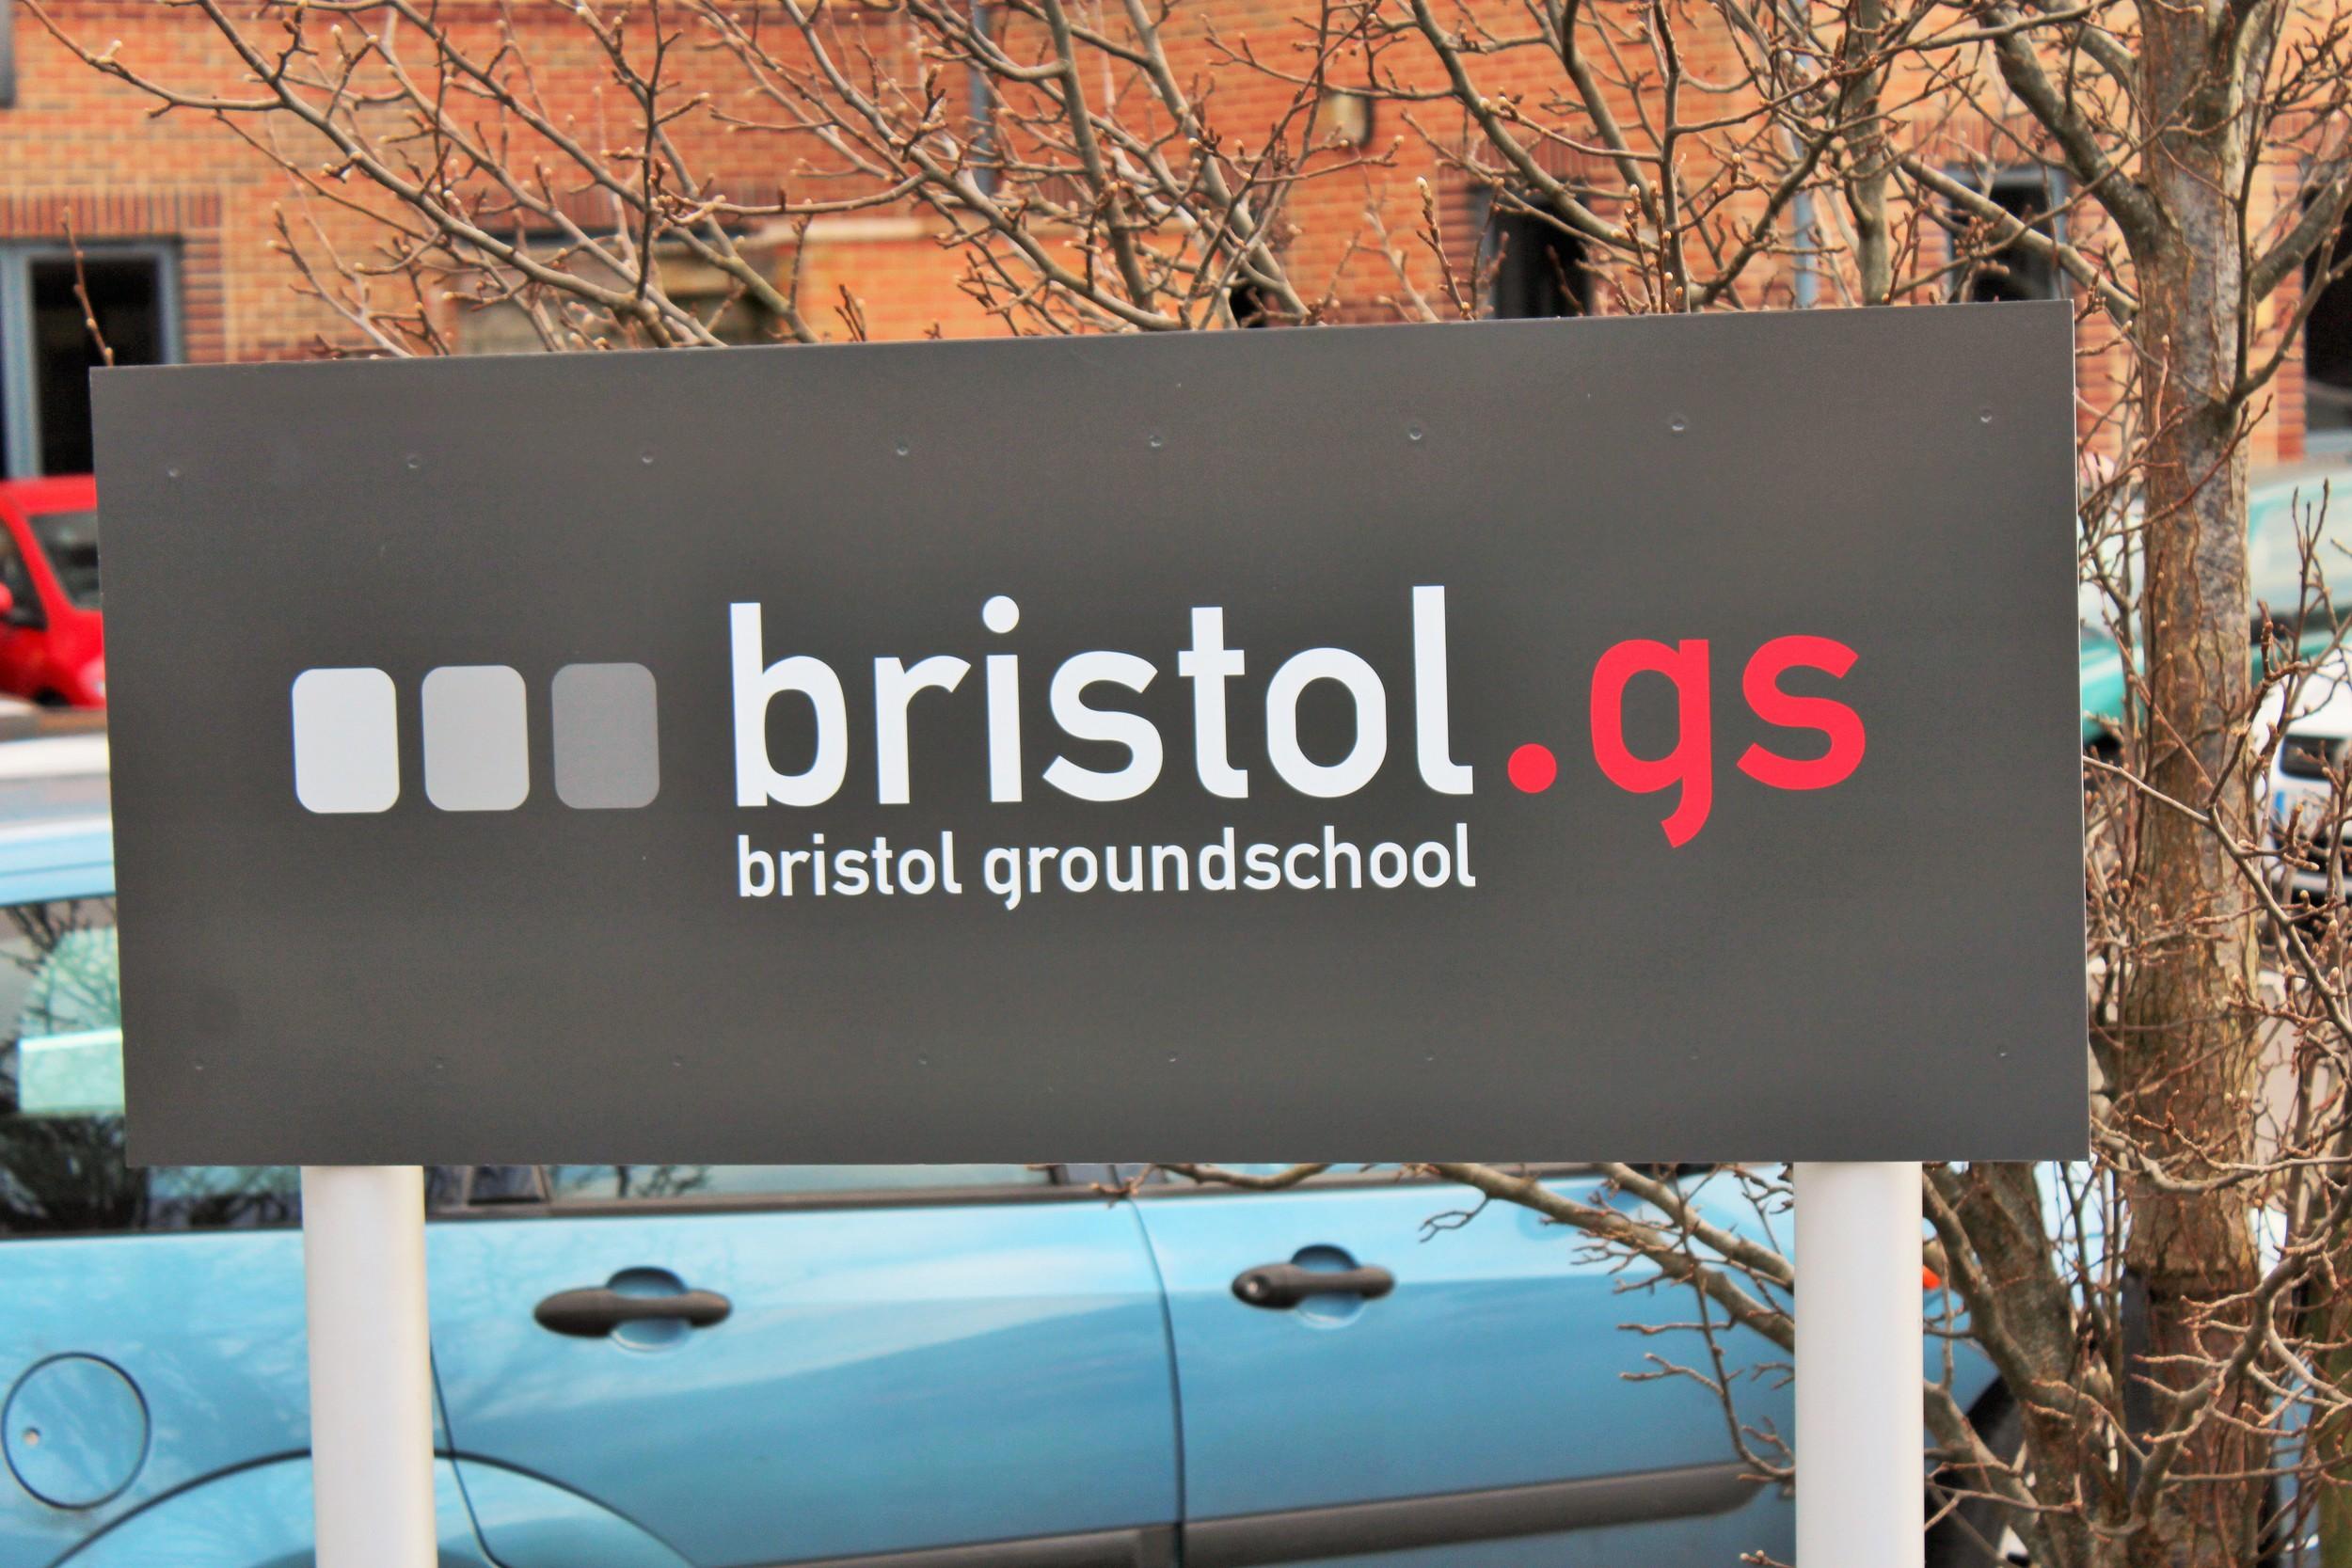 Case study: Bristol Groundschool